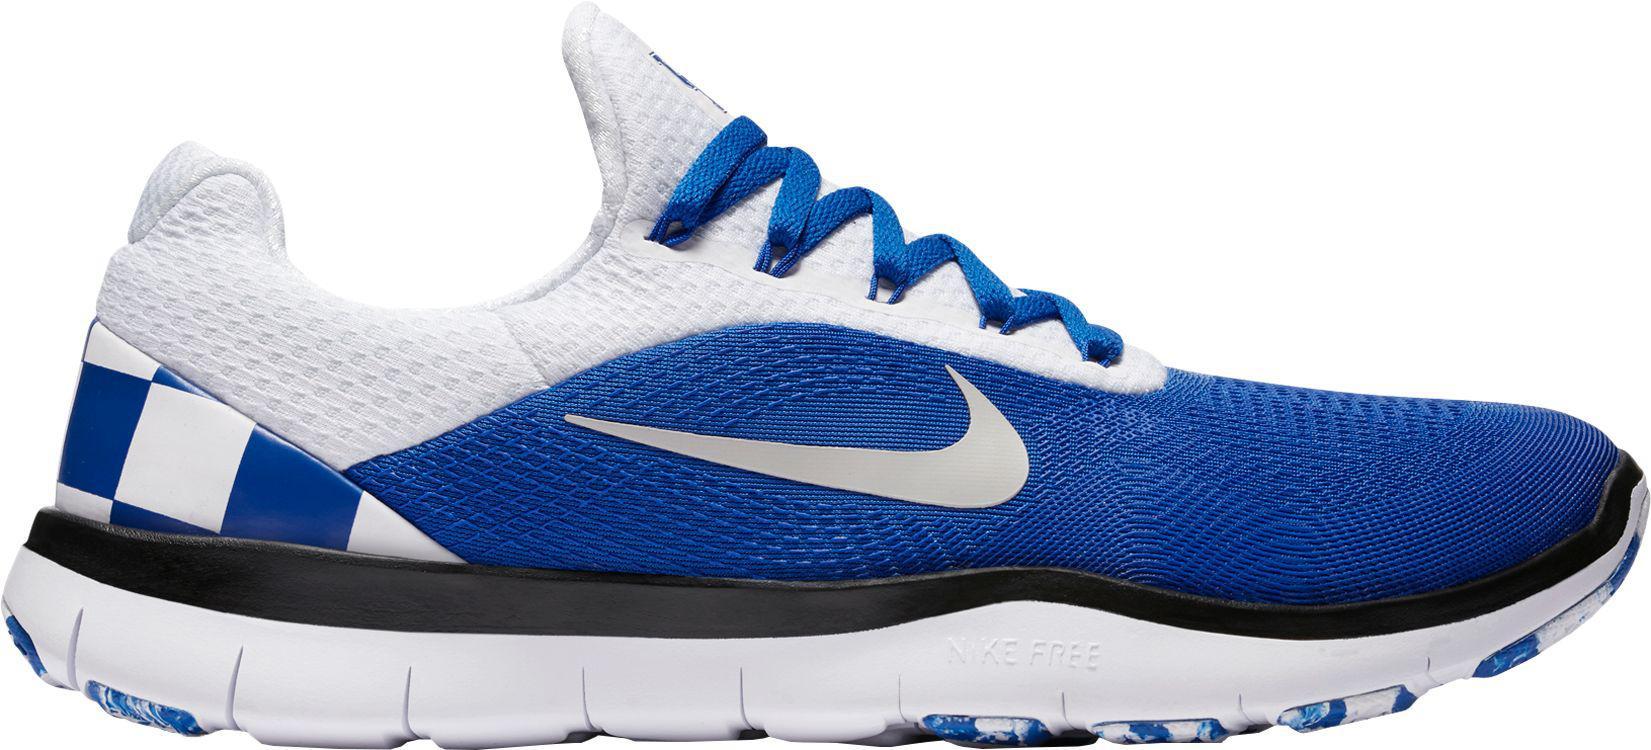 Nike. Men's Blue Free Trainer V7 Week Zero Kentucky Edition Training Shoes